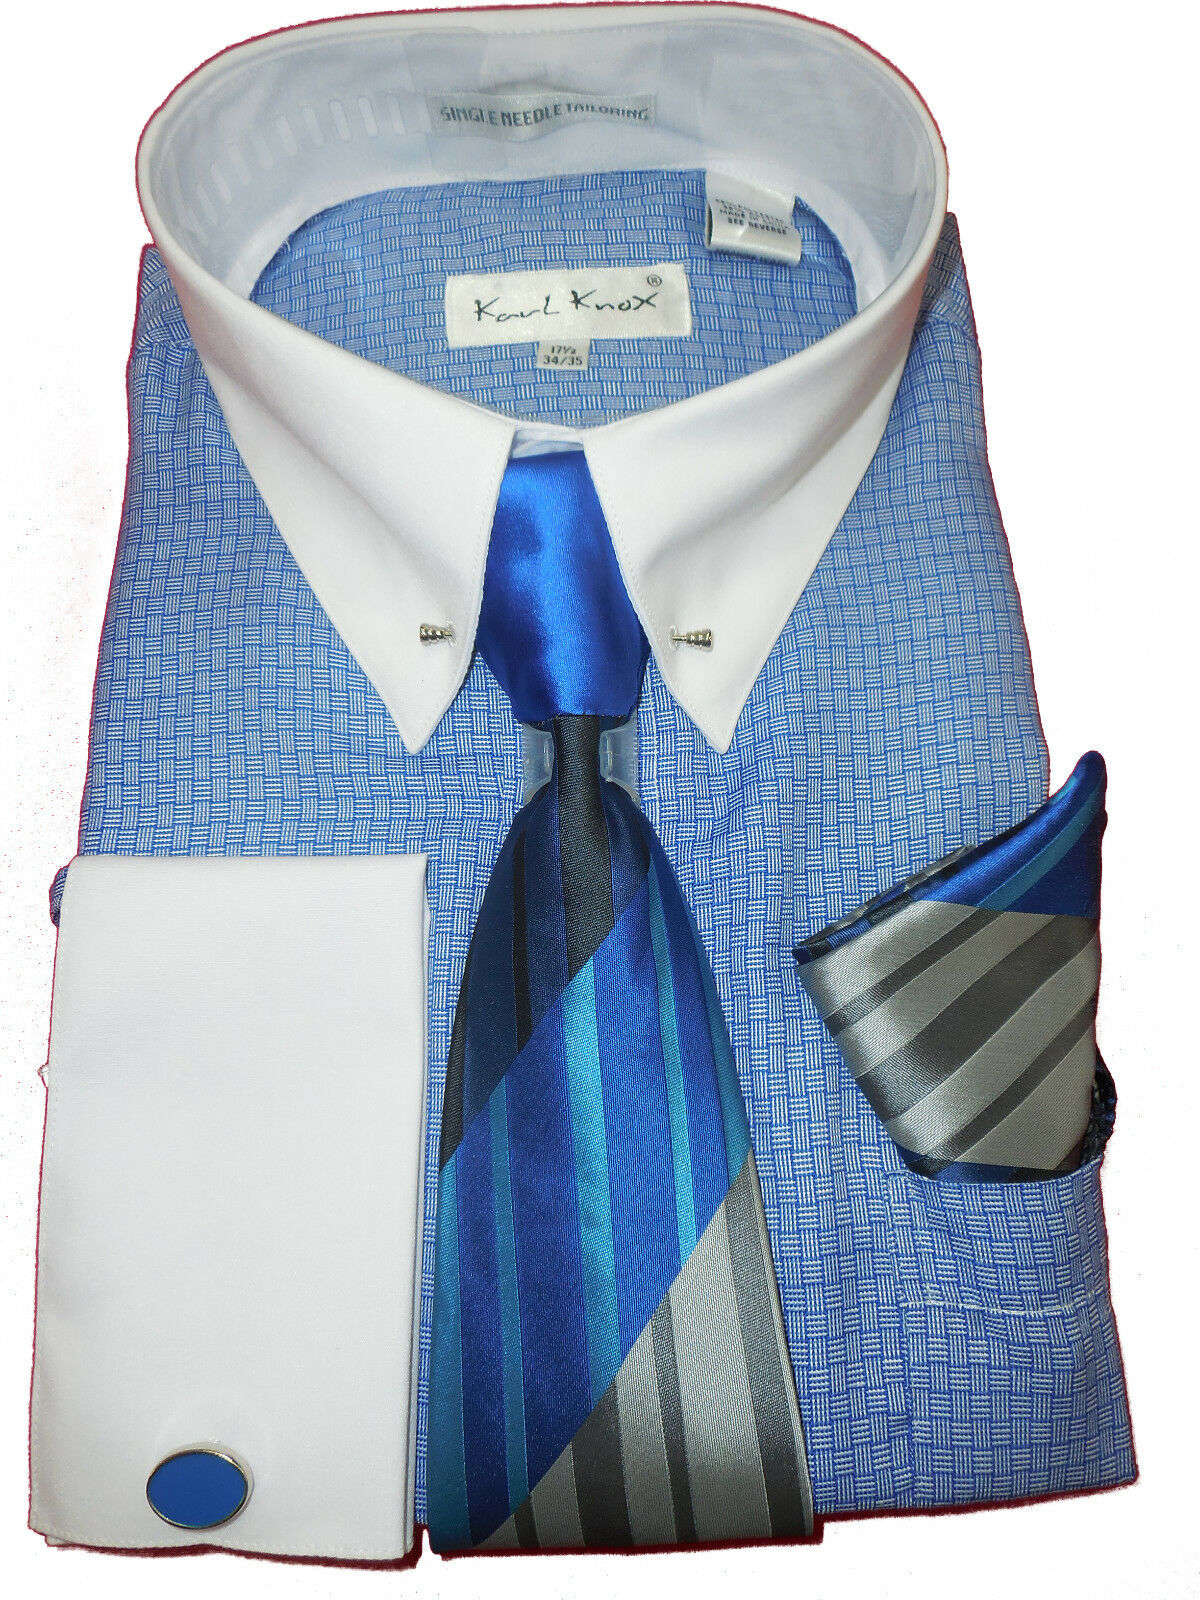 Tie Karl Knox 4389 Mens Royal Blue Club Collar Pin Bar French Cuff Dress Shirt